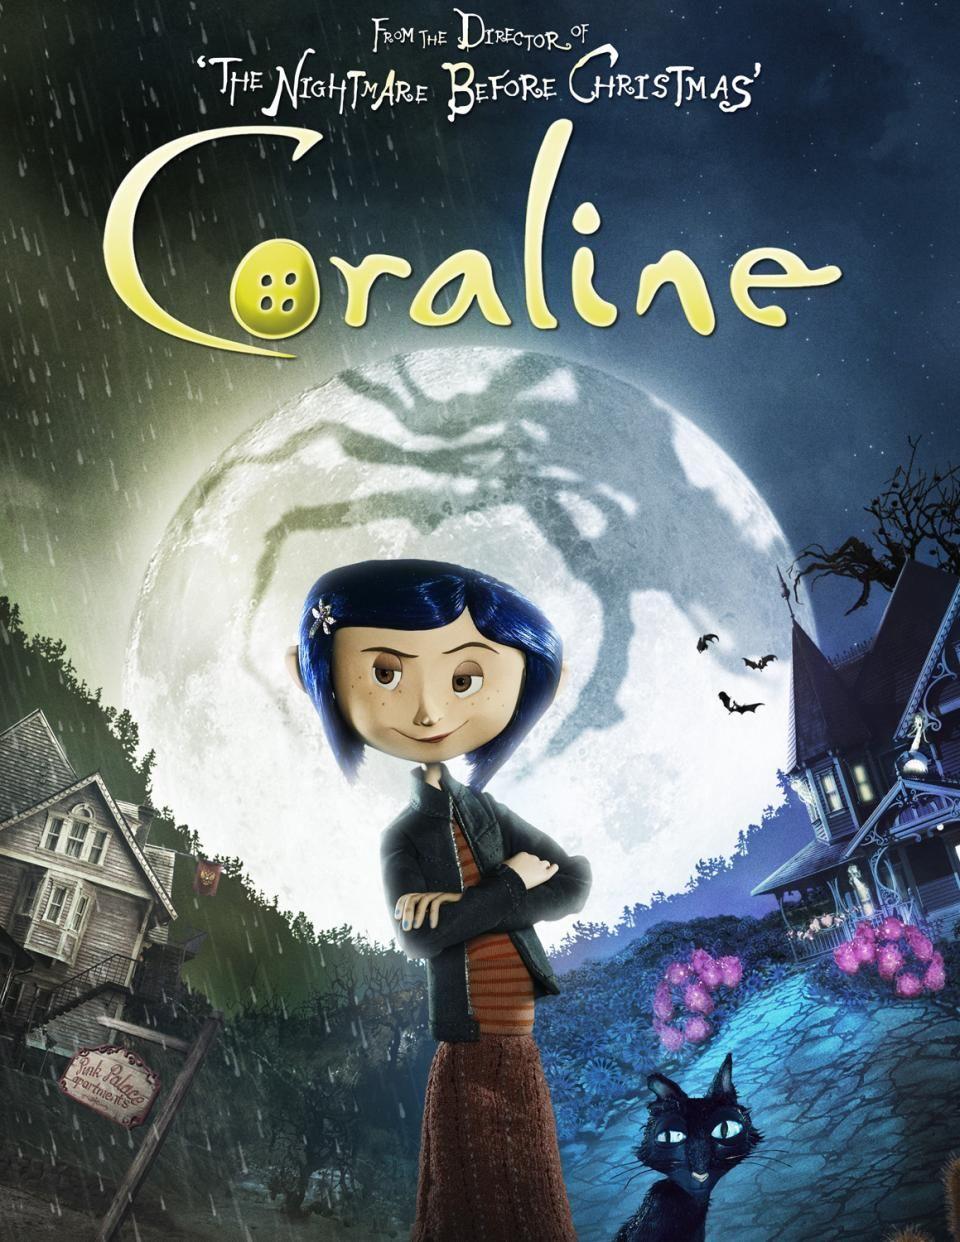 Coraline(6/2/14)☆☆☆½